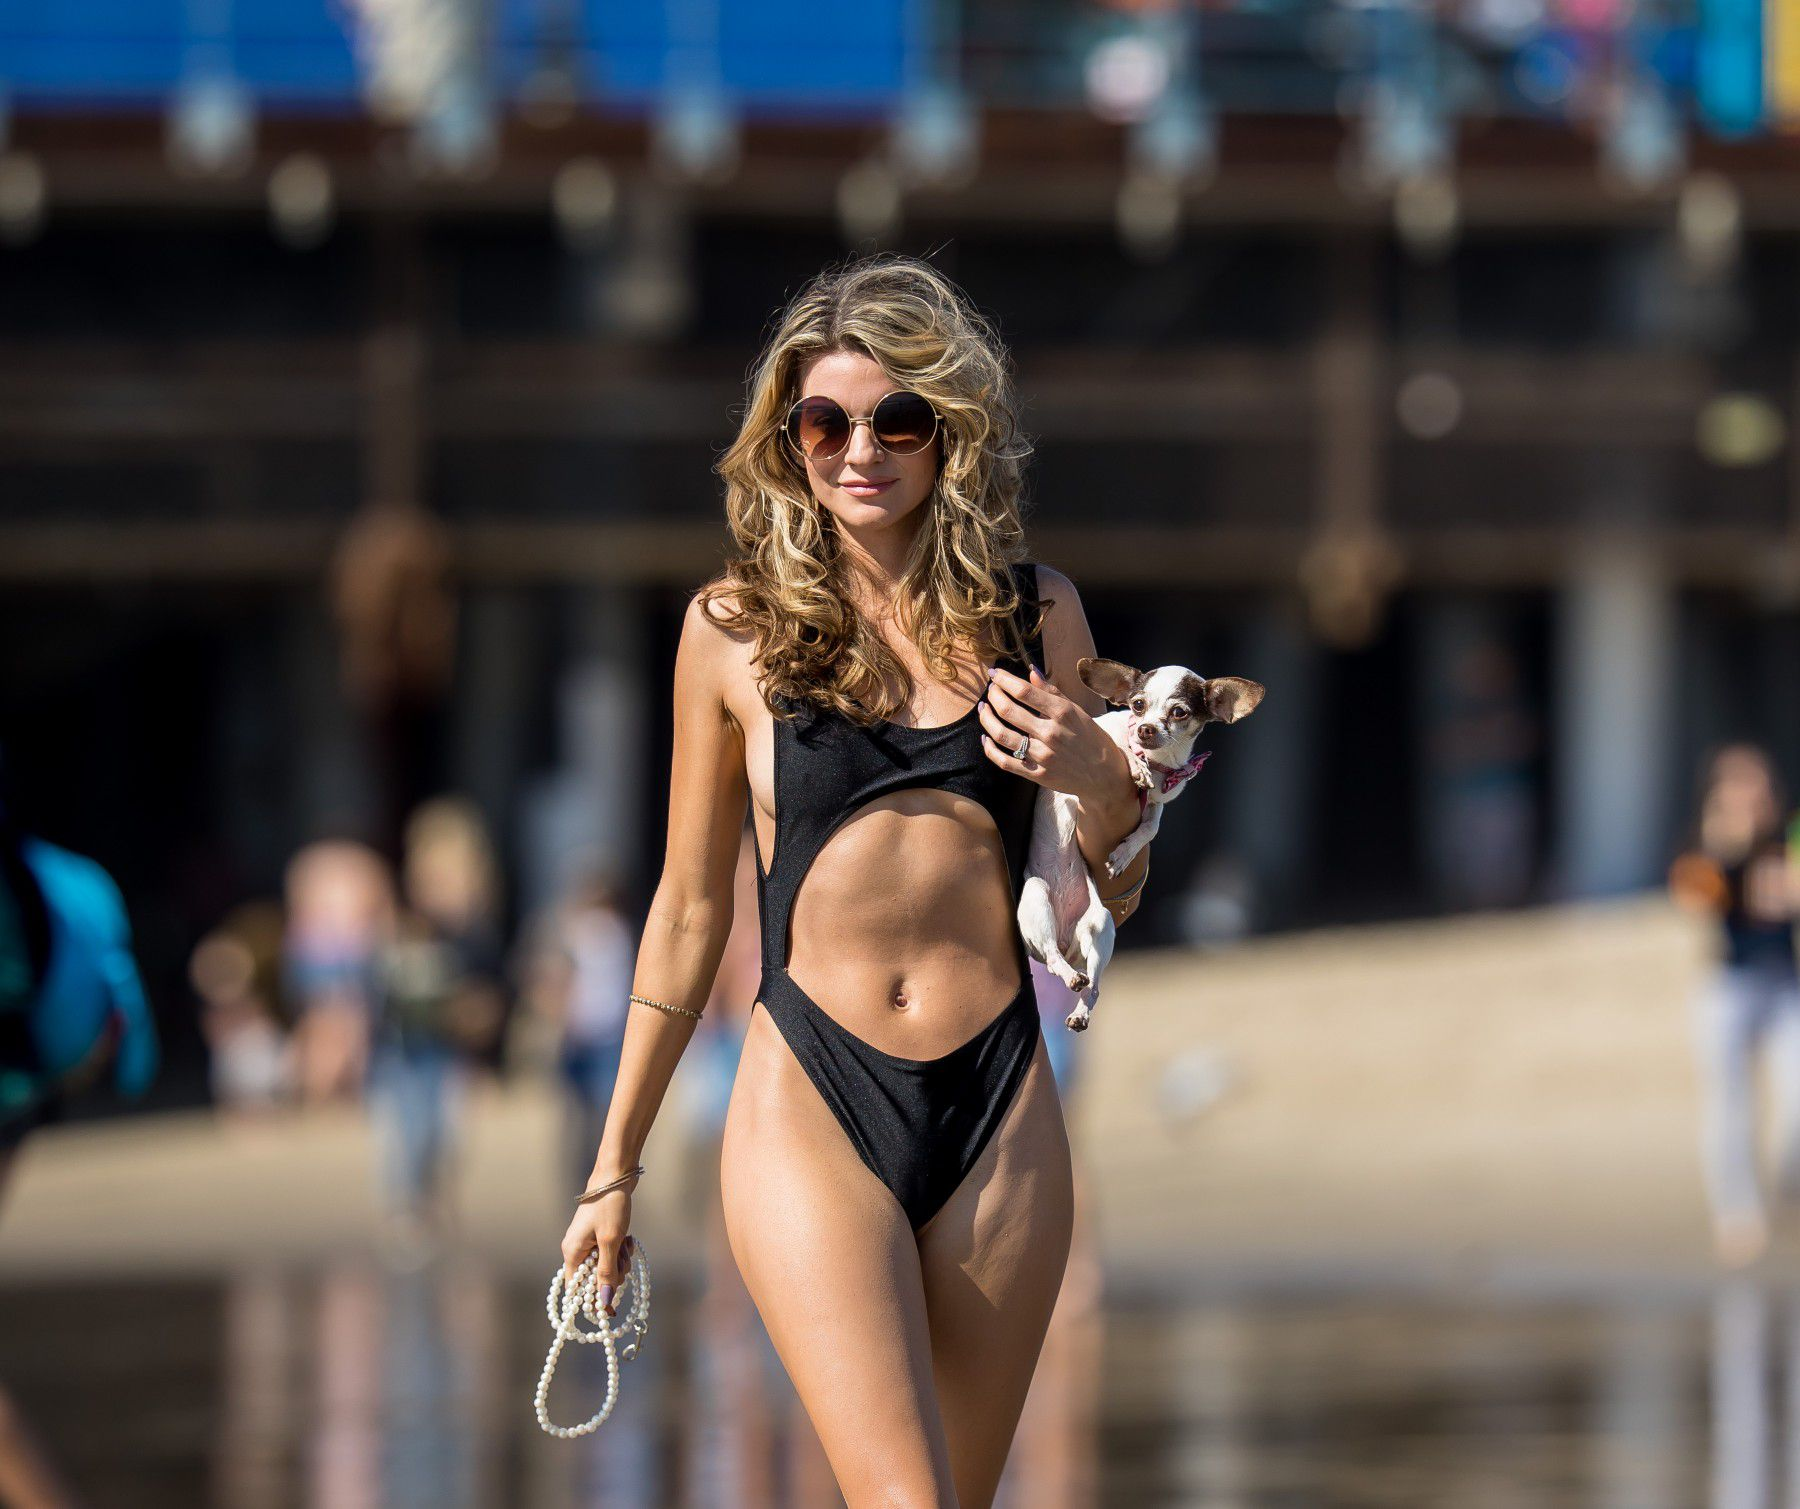 rachel-mccord-cameltoe-in-black-swimsuit-on-the-beach-in-santa-monica-7428